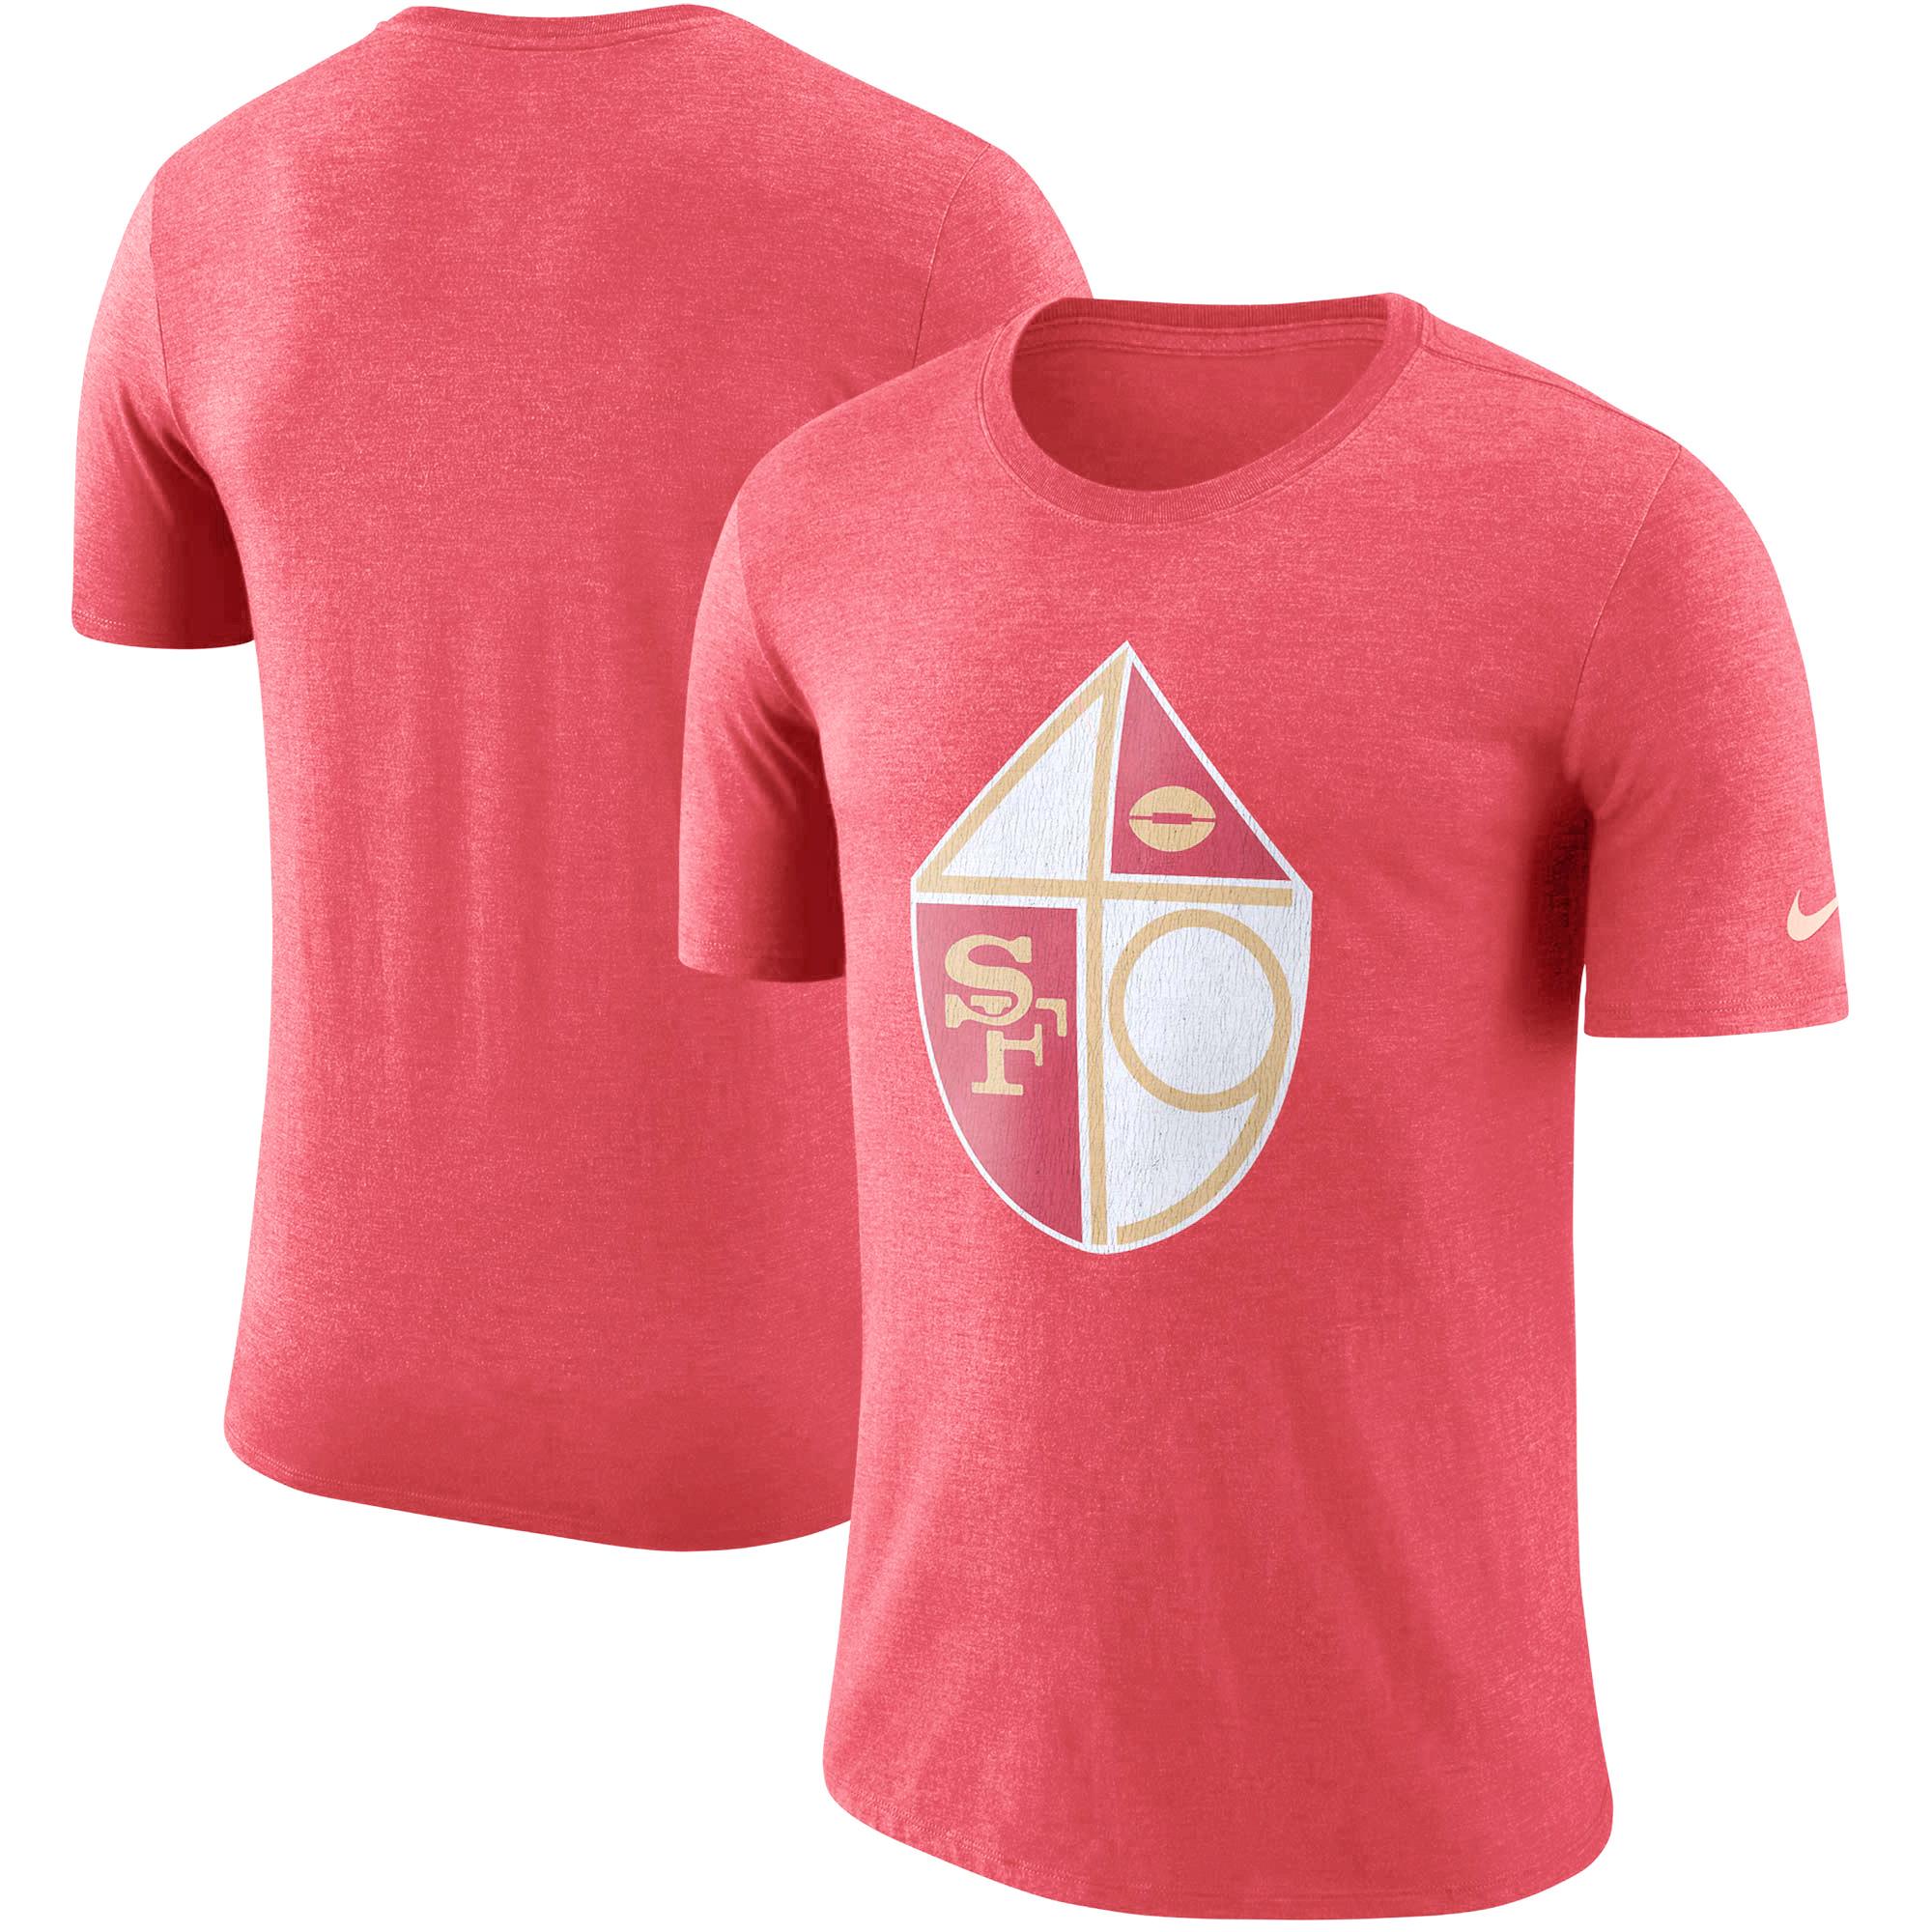 San Francisco 49ers Nike Historic Tri-Blend Crackle T-Shirt - Heathered Scarlet